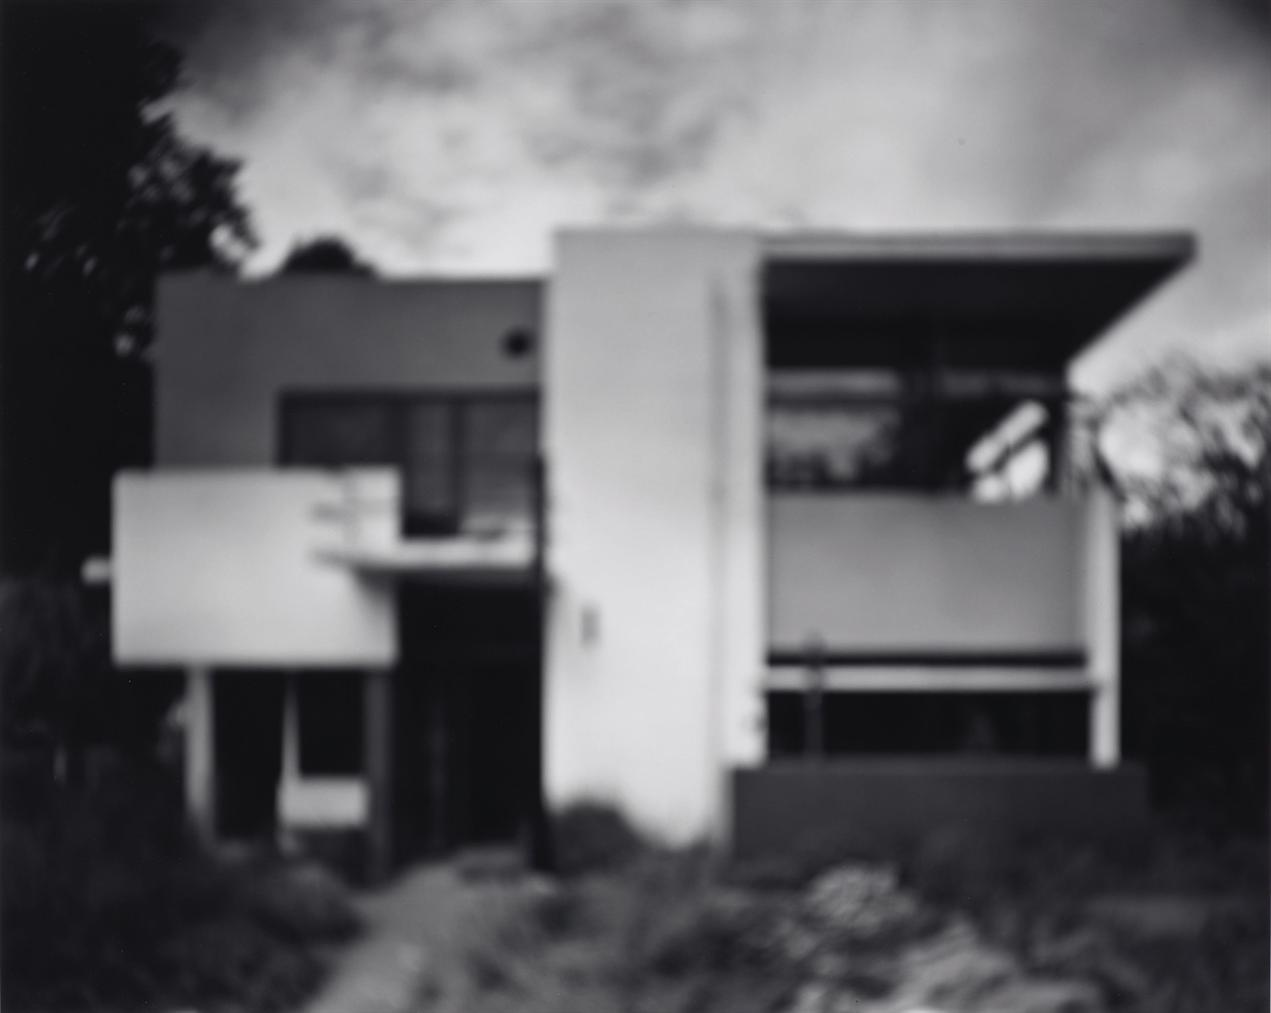 Hiroshi Sugimoto-Rietveld Schroder House-1999